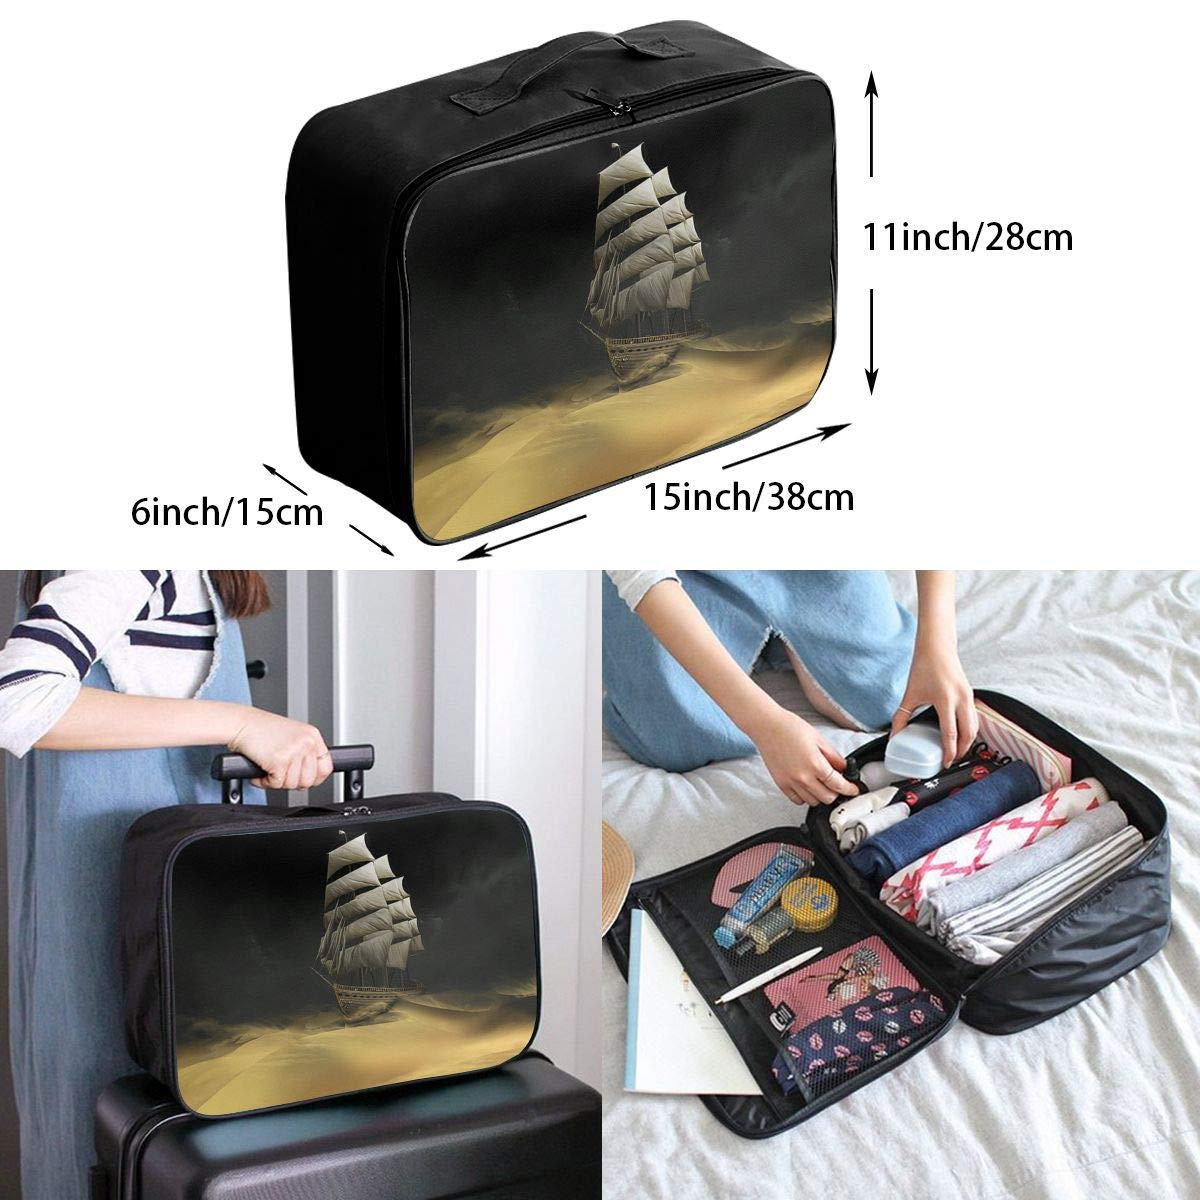 Travel Luggage Duffle Bag Lightweight Portable Handbag Boat Large Capacity Waterproof Foldable Storage Tote